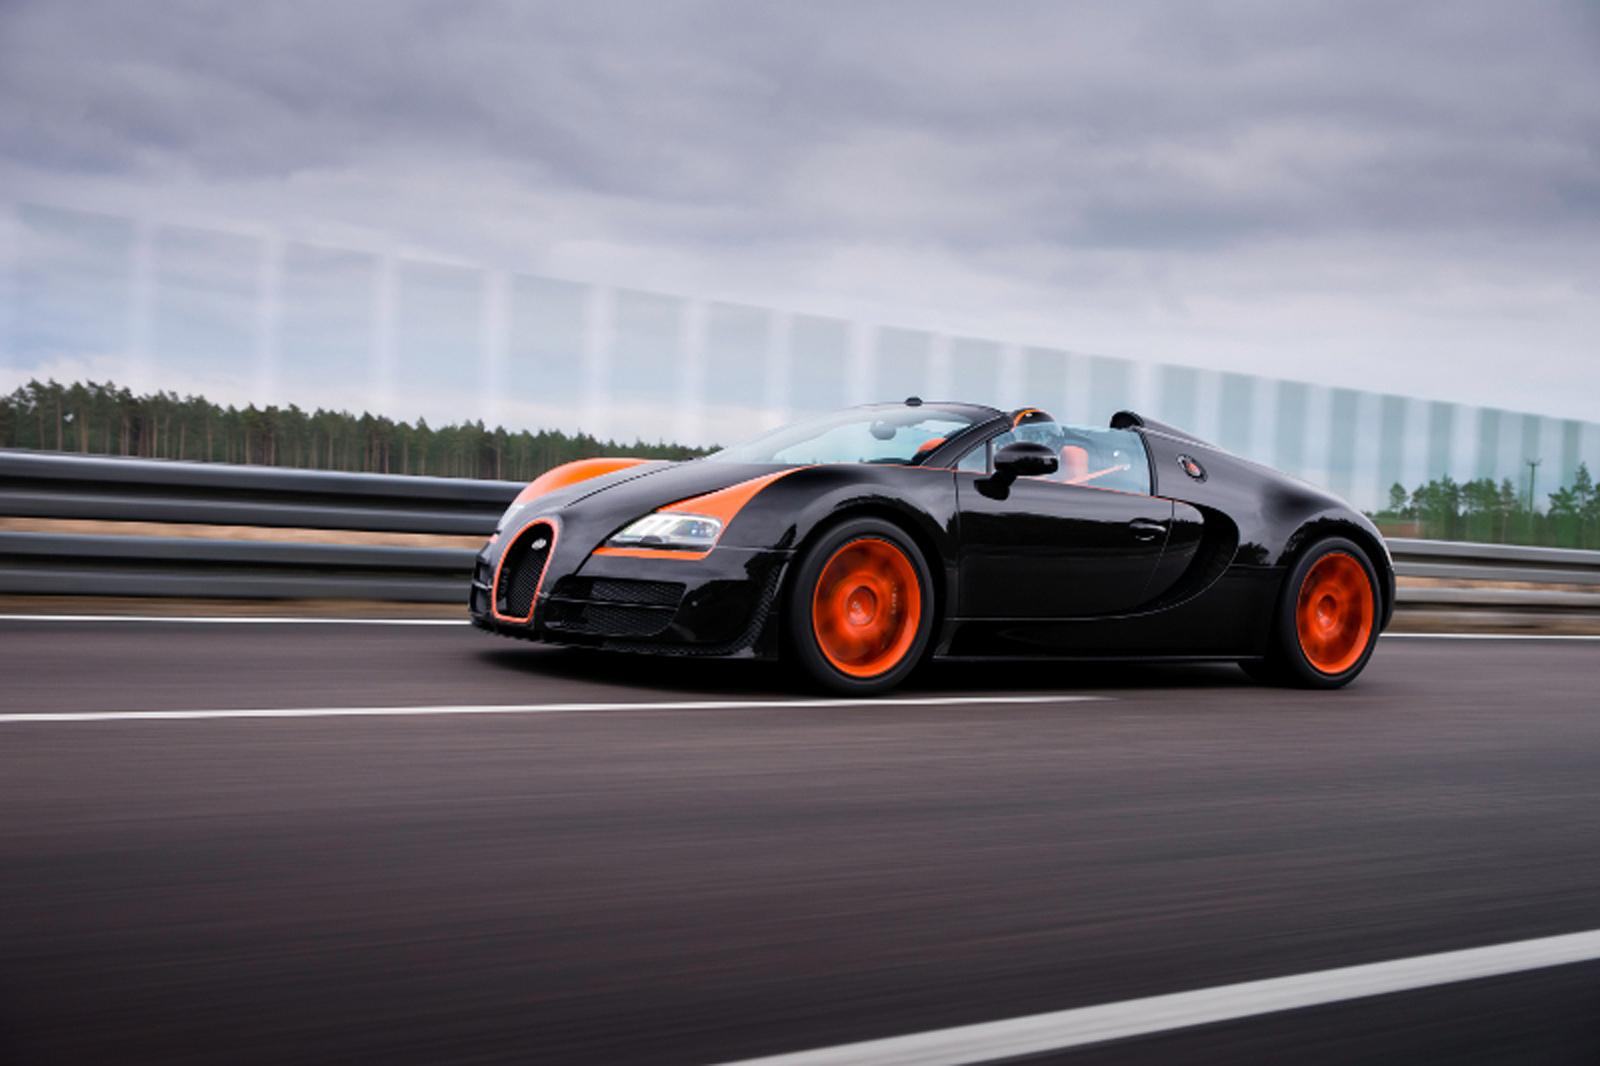 foto exteriores 13 bugatti veyron grand sport vitesse record cupe 2013. Black Bedroom Furniture Sets. Home Design Ideas